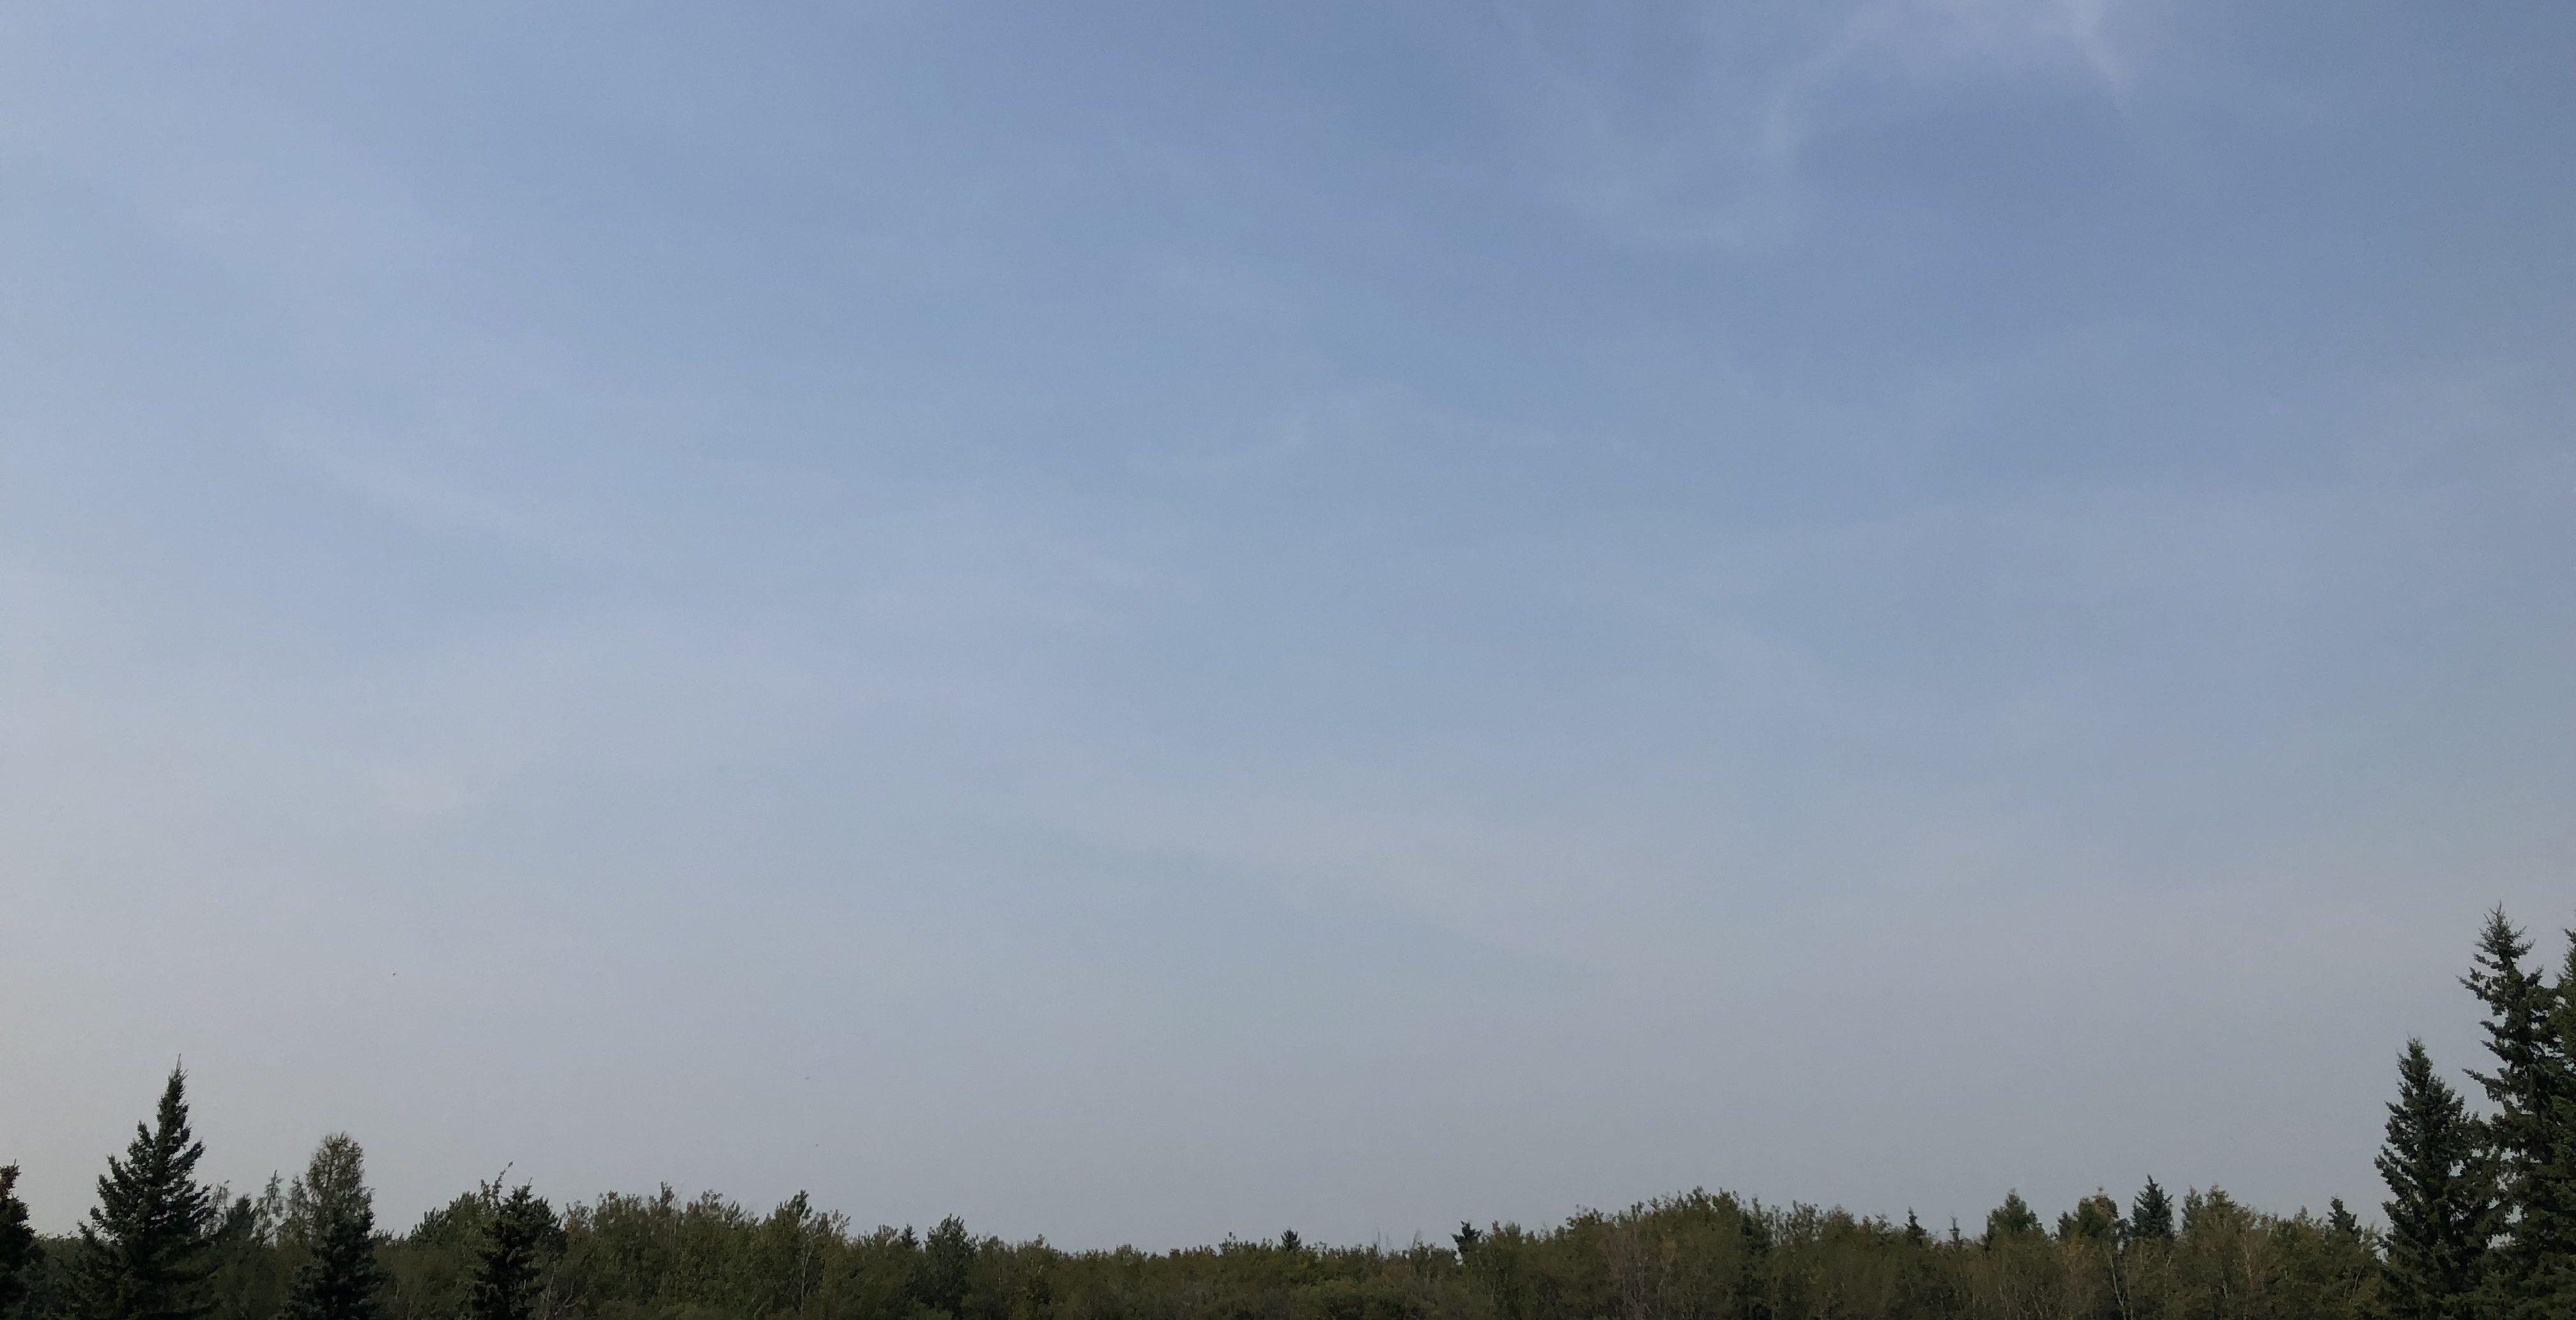 Raising air quality concerns across Alberta